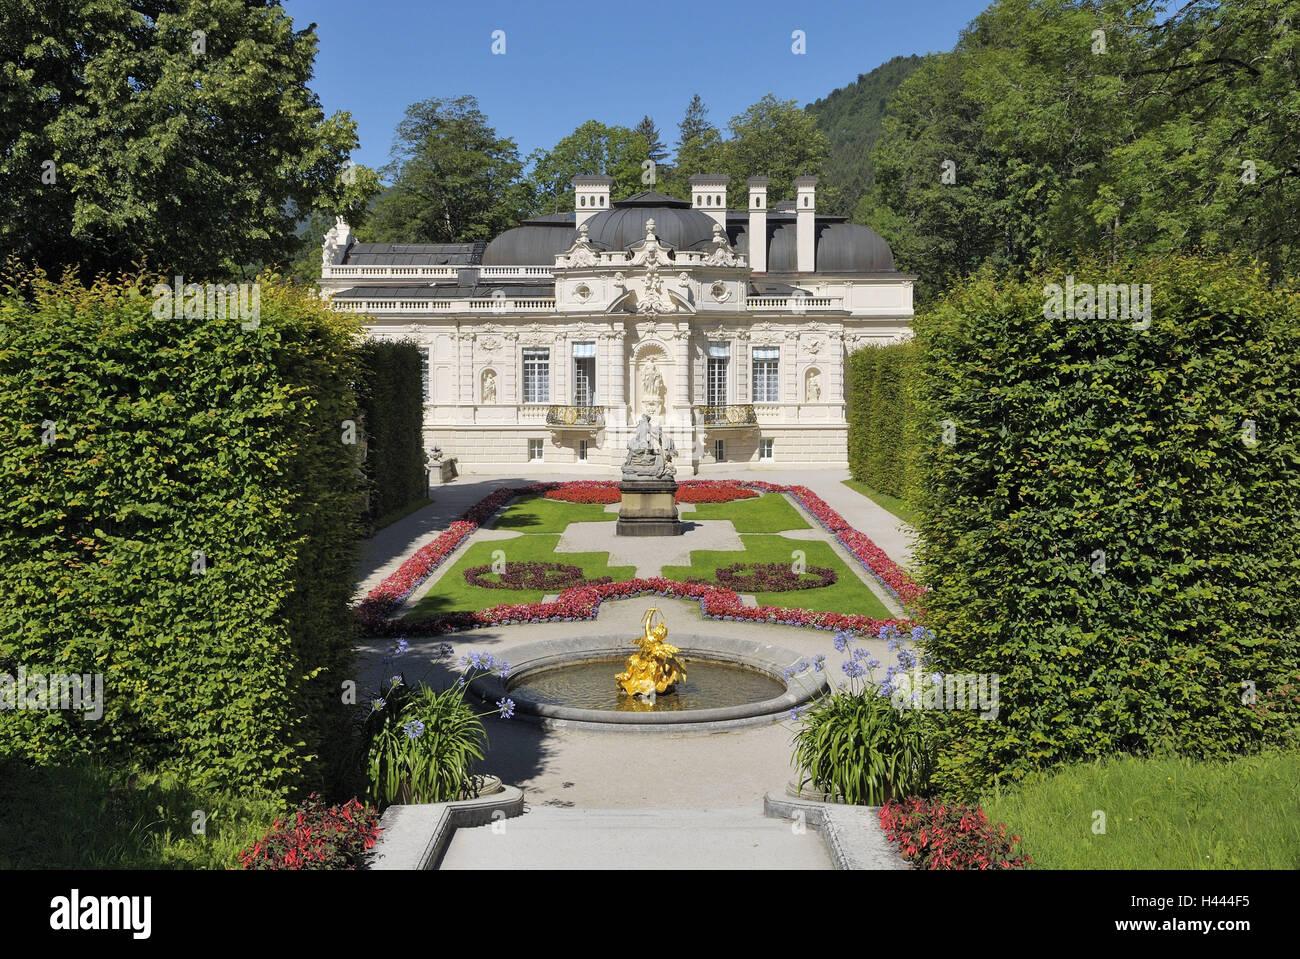 Lock gentle court, facade, window, balconies, grids, roof, chimneys, garden, well, statues, gold, patches, to discounts, - Stock Image